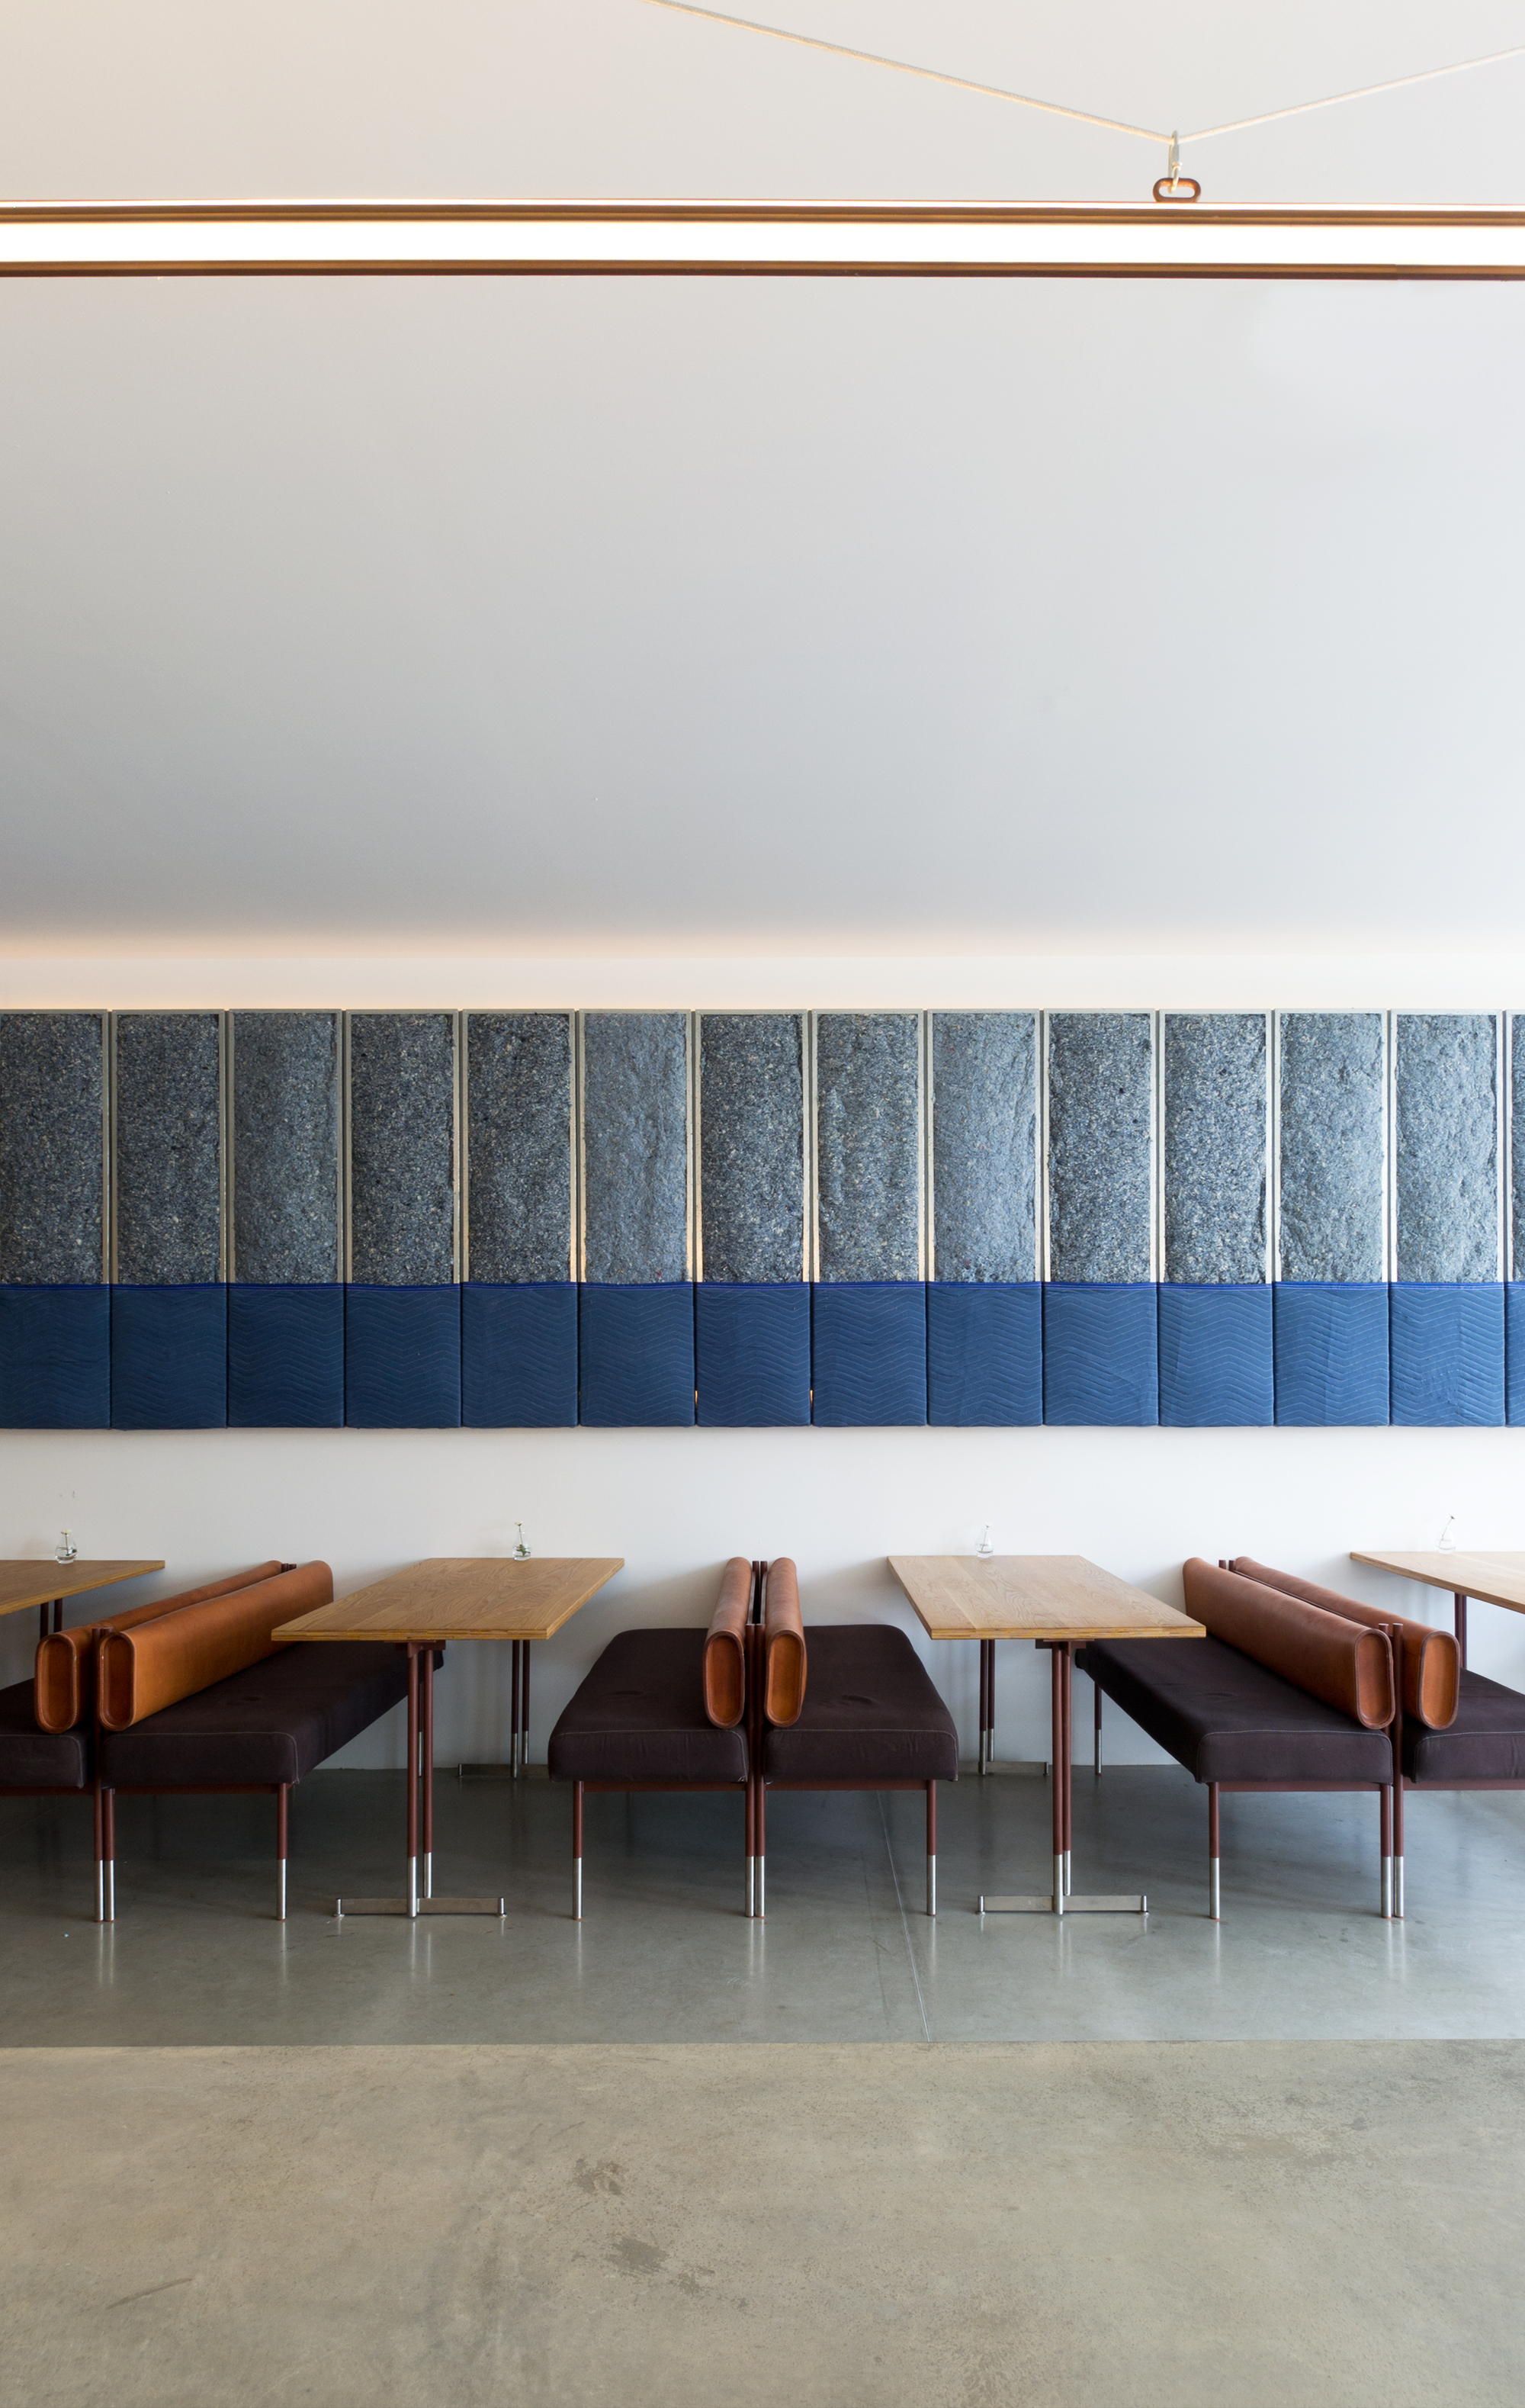 Gallery of 2016 restaurant bar design awards announced 3 for Interior design show vancouver 2016